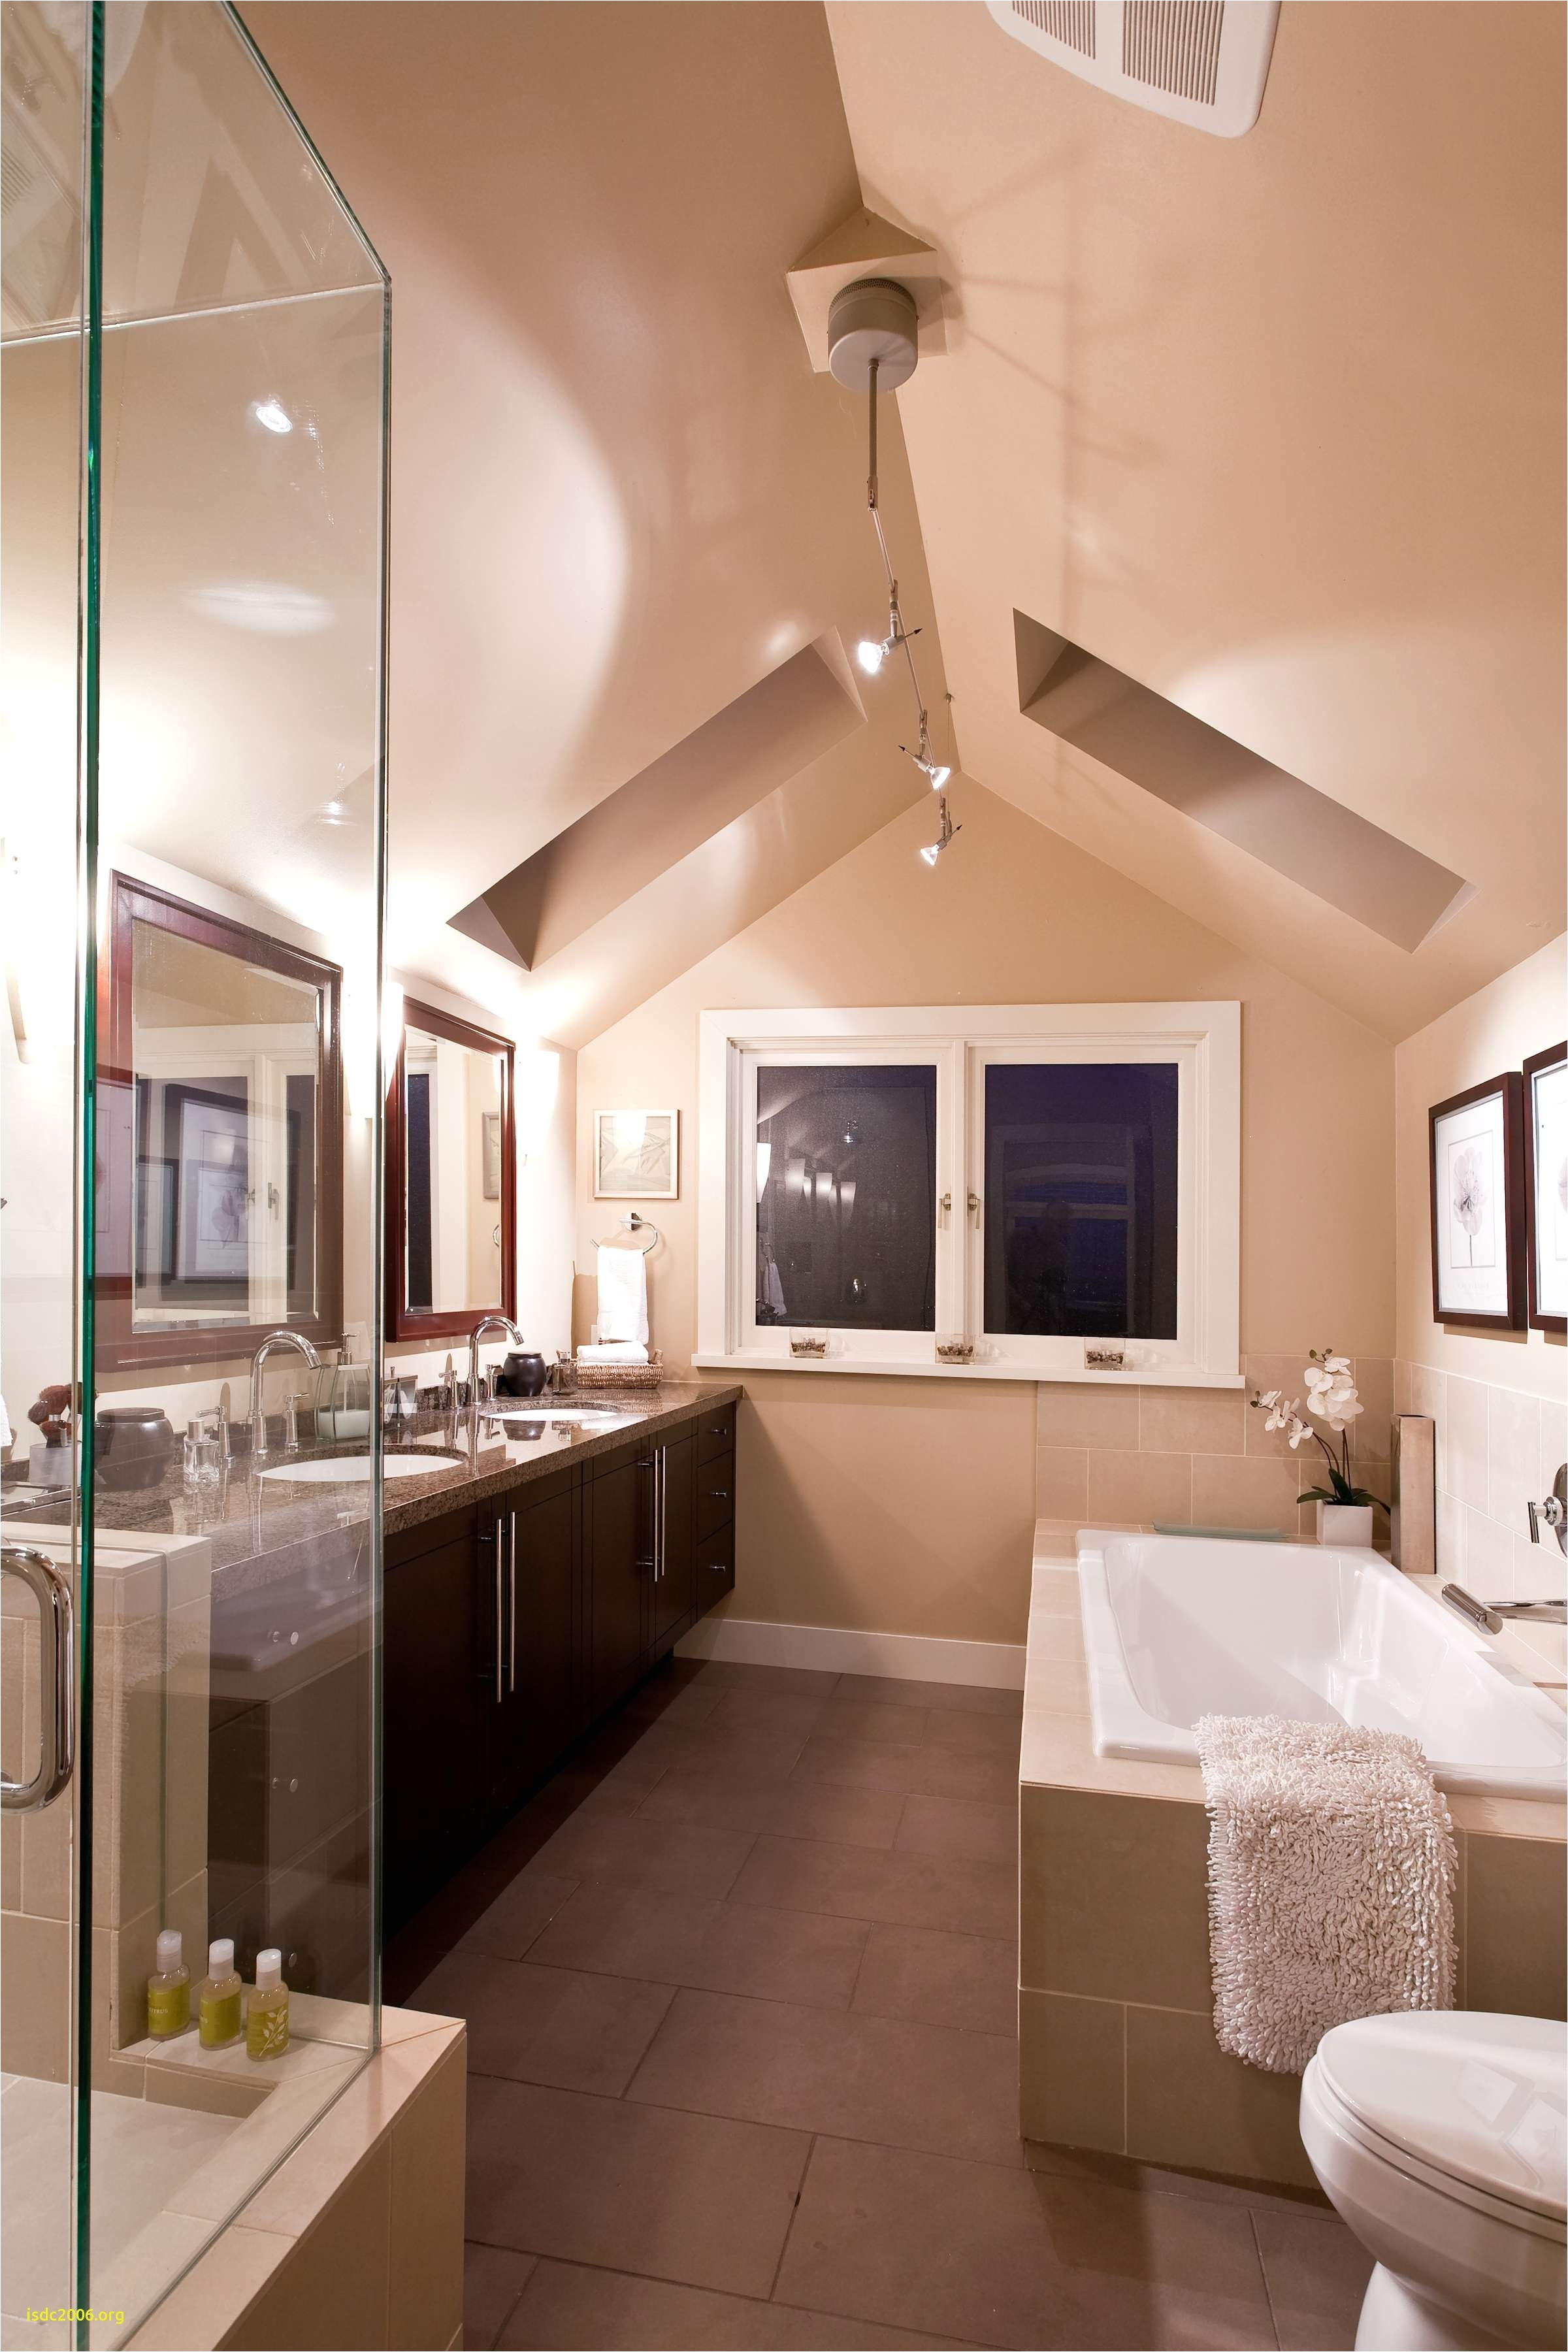 Bathroom Ceiling Design Ideas Luxury Ideas for Bathrooms